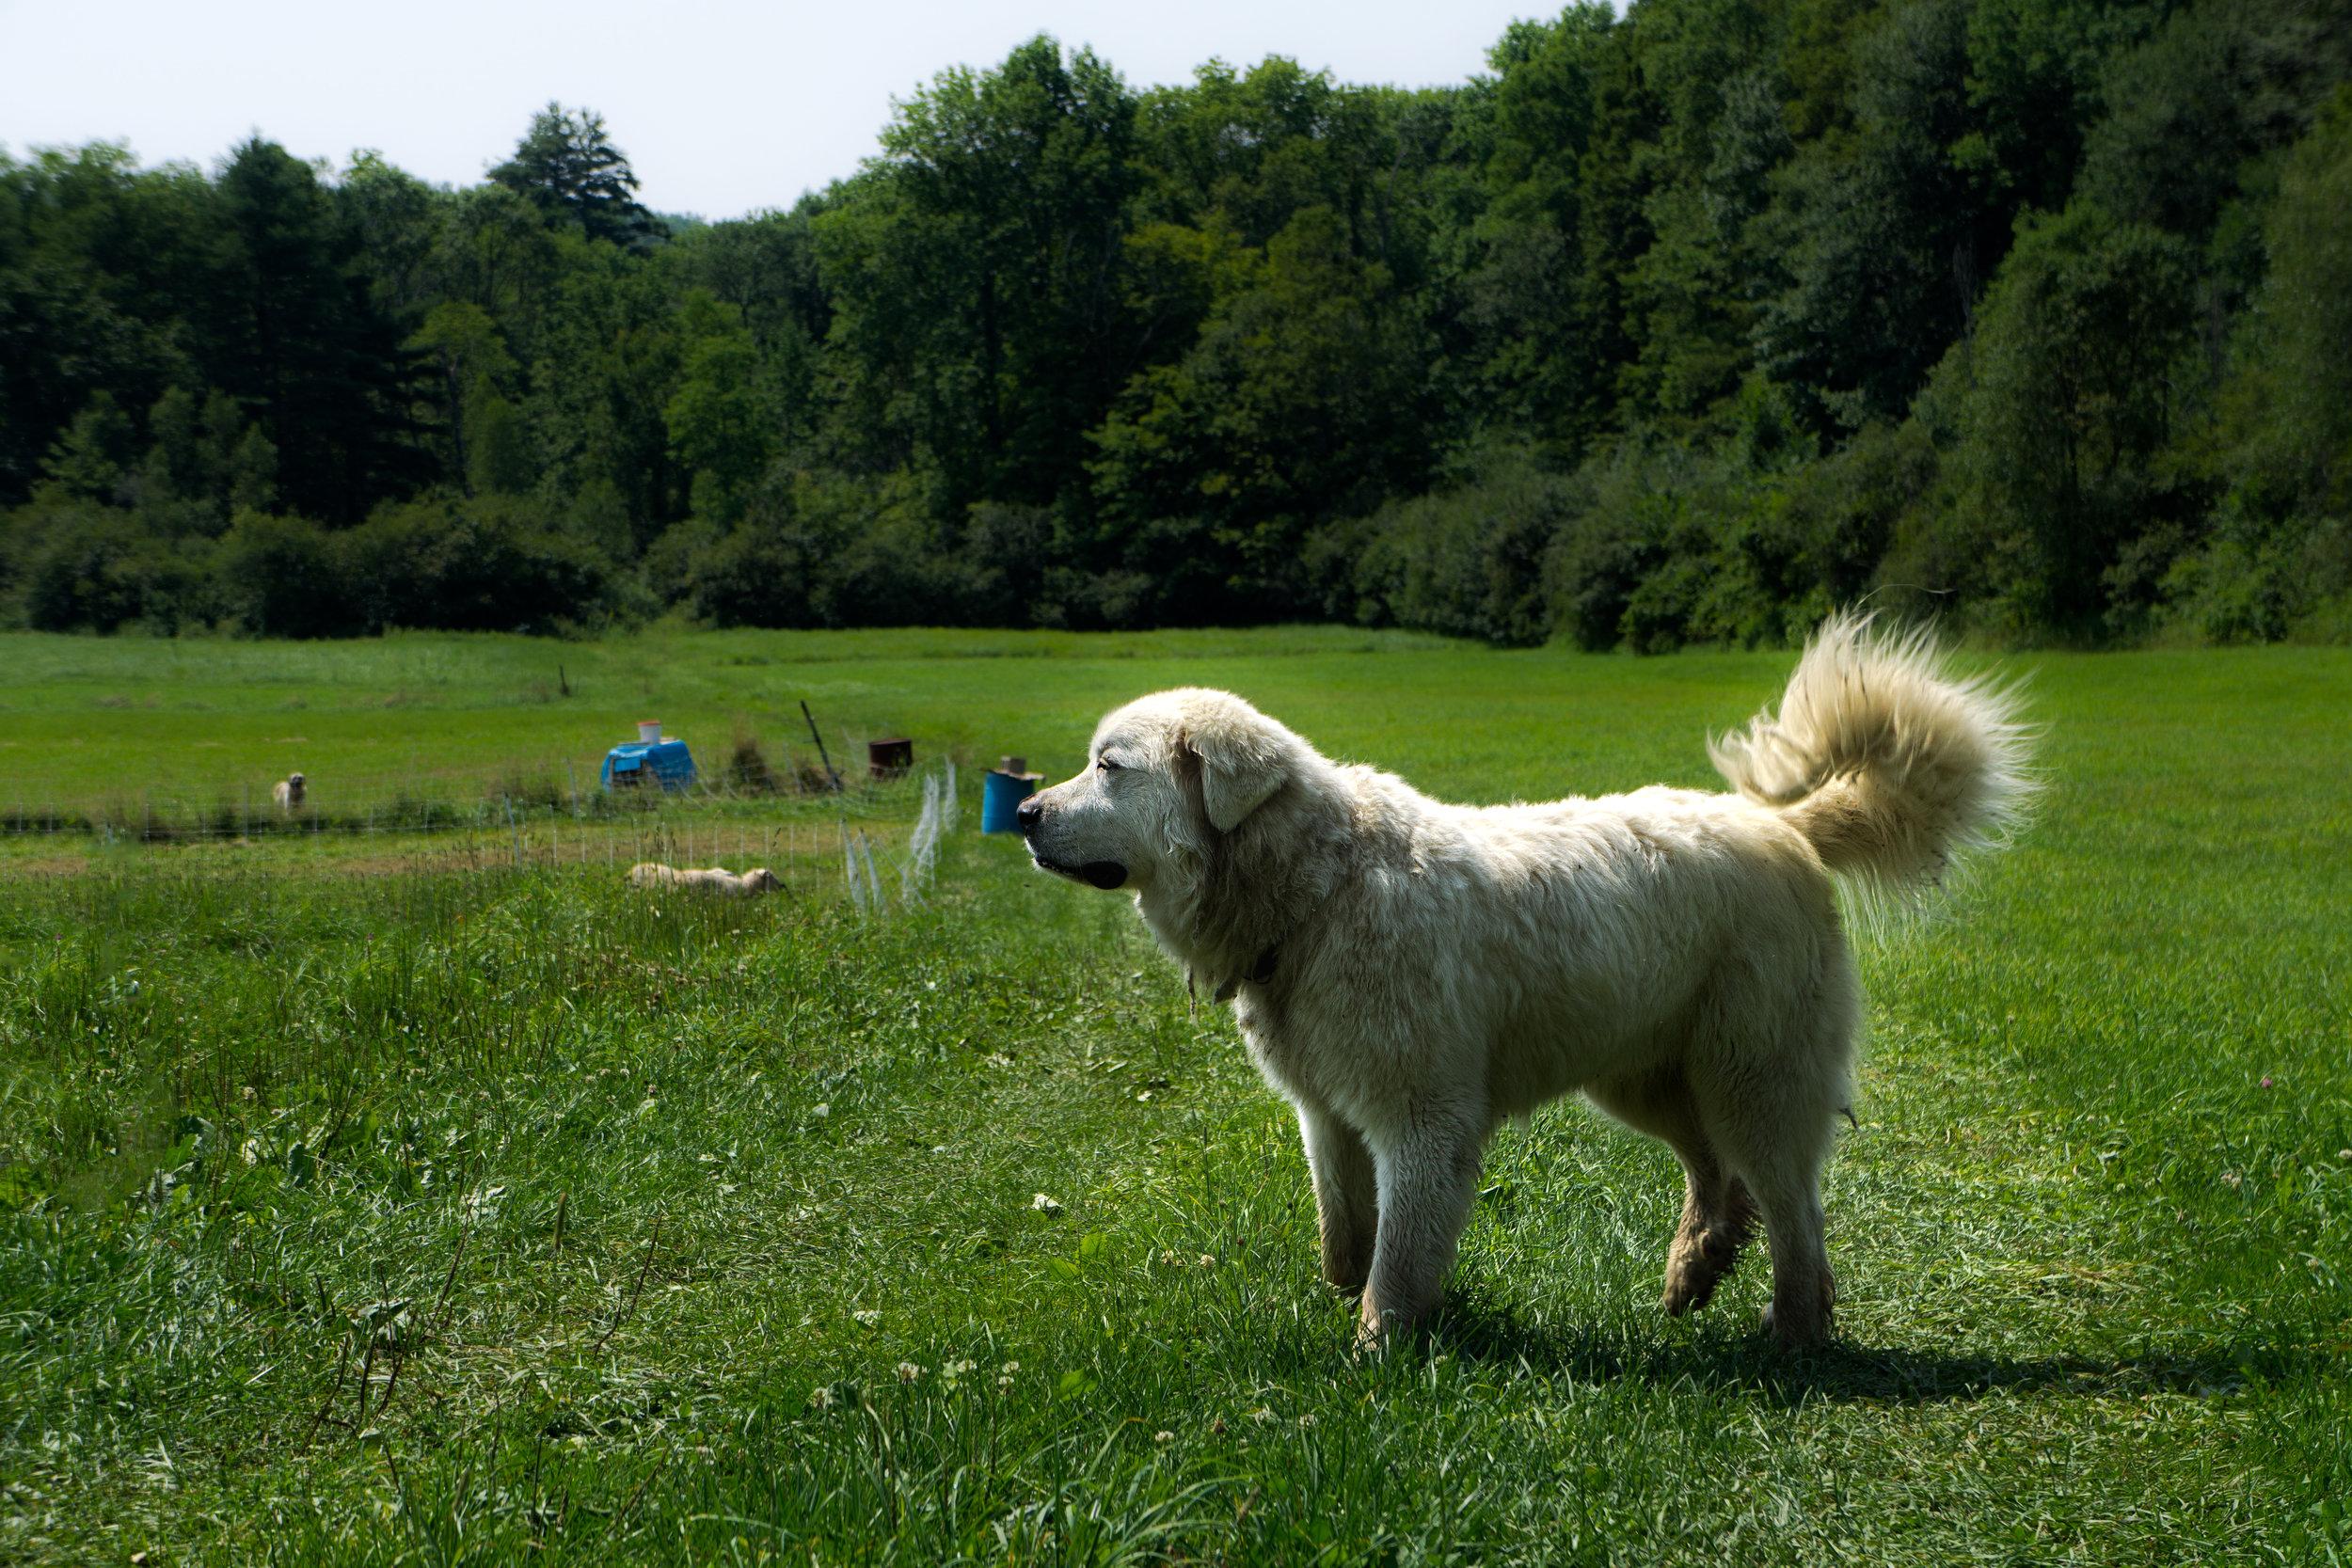 vickygood_photography_dog_series5.jpg